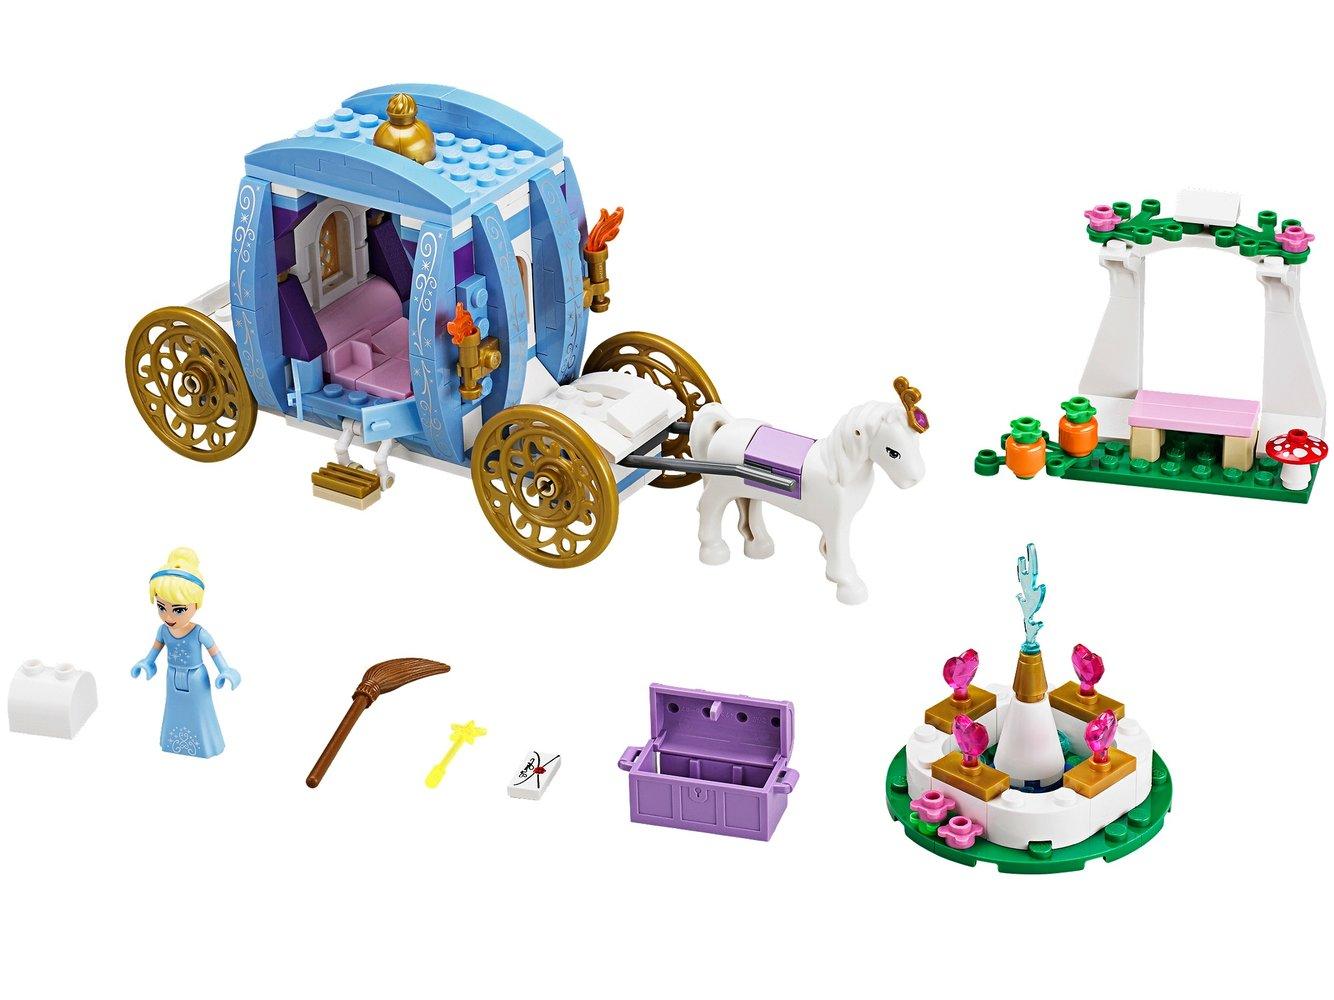 Cinderella's Dream Carriage